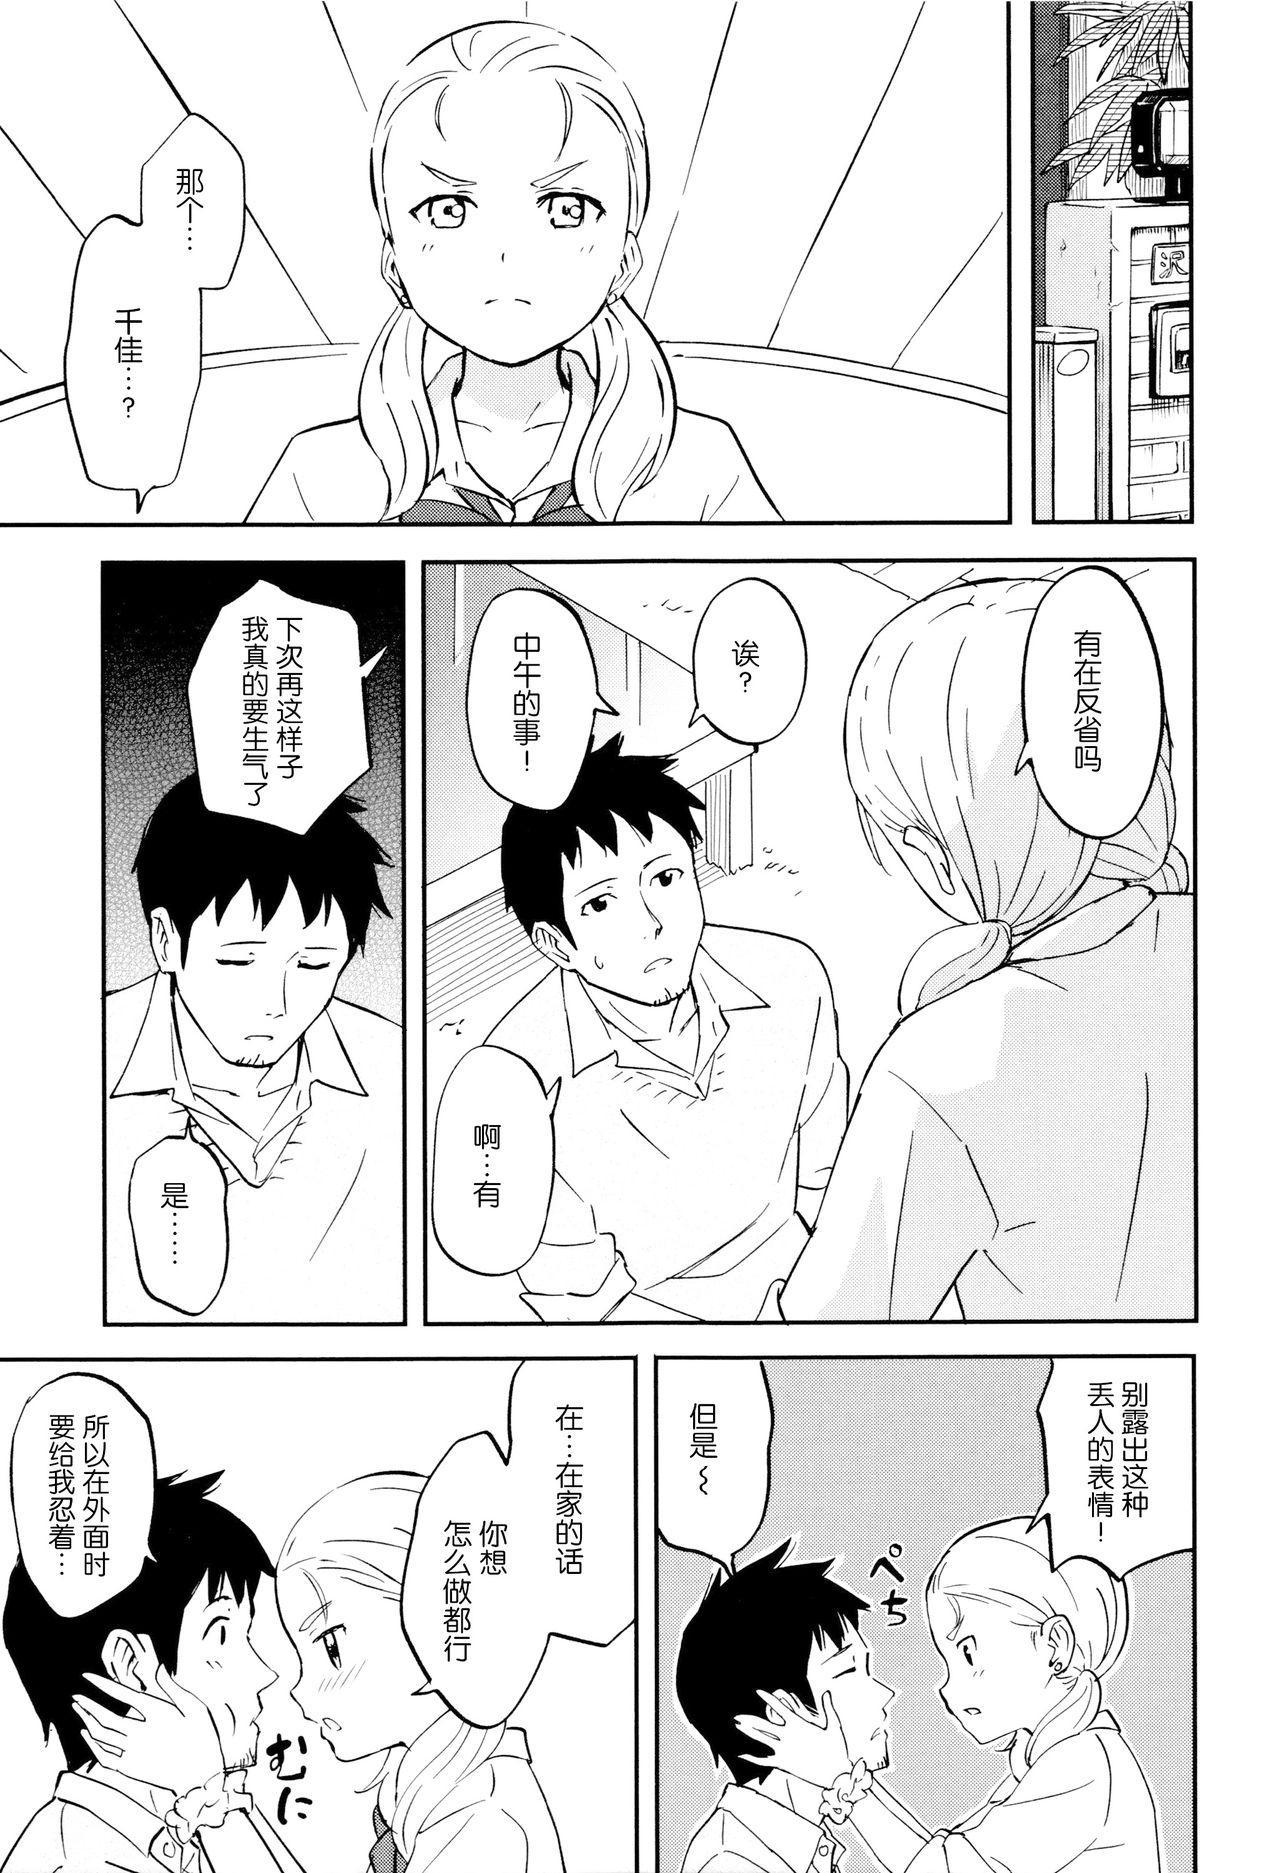 Tokubetsu na Mainichi - Special daily 81